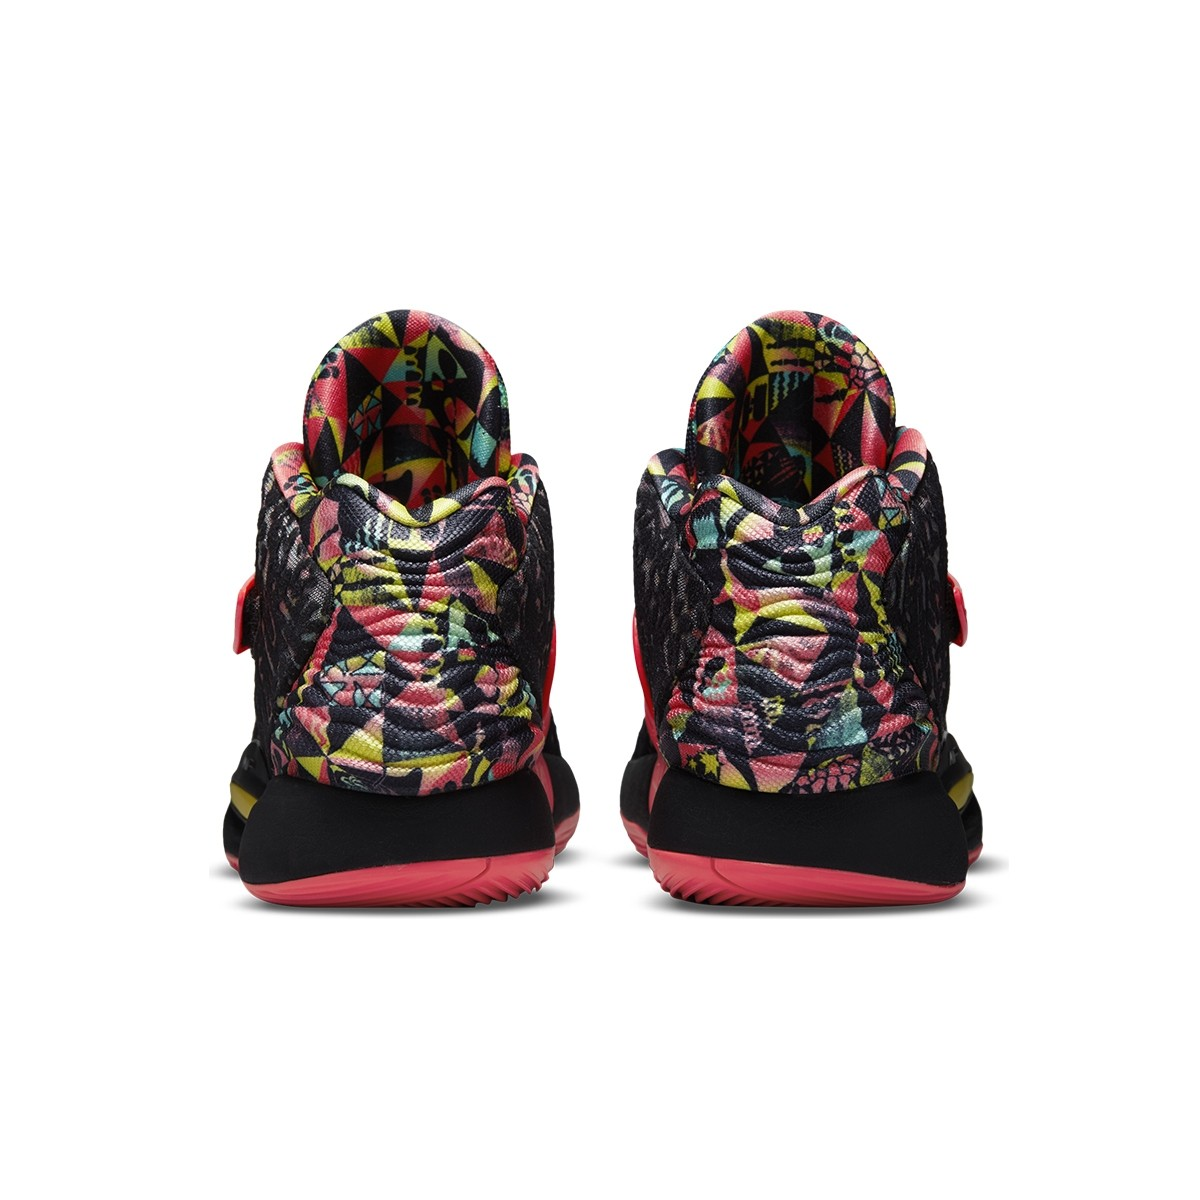 Nike KD14 'Ky-D'-CW3935-002